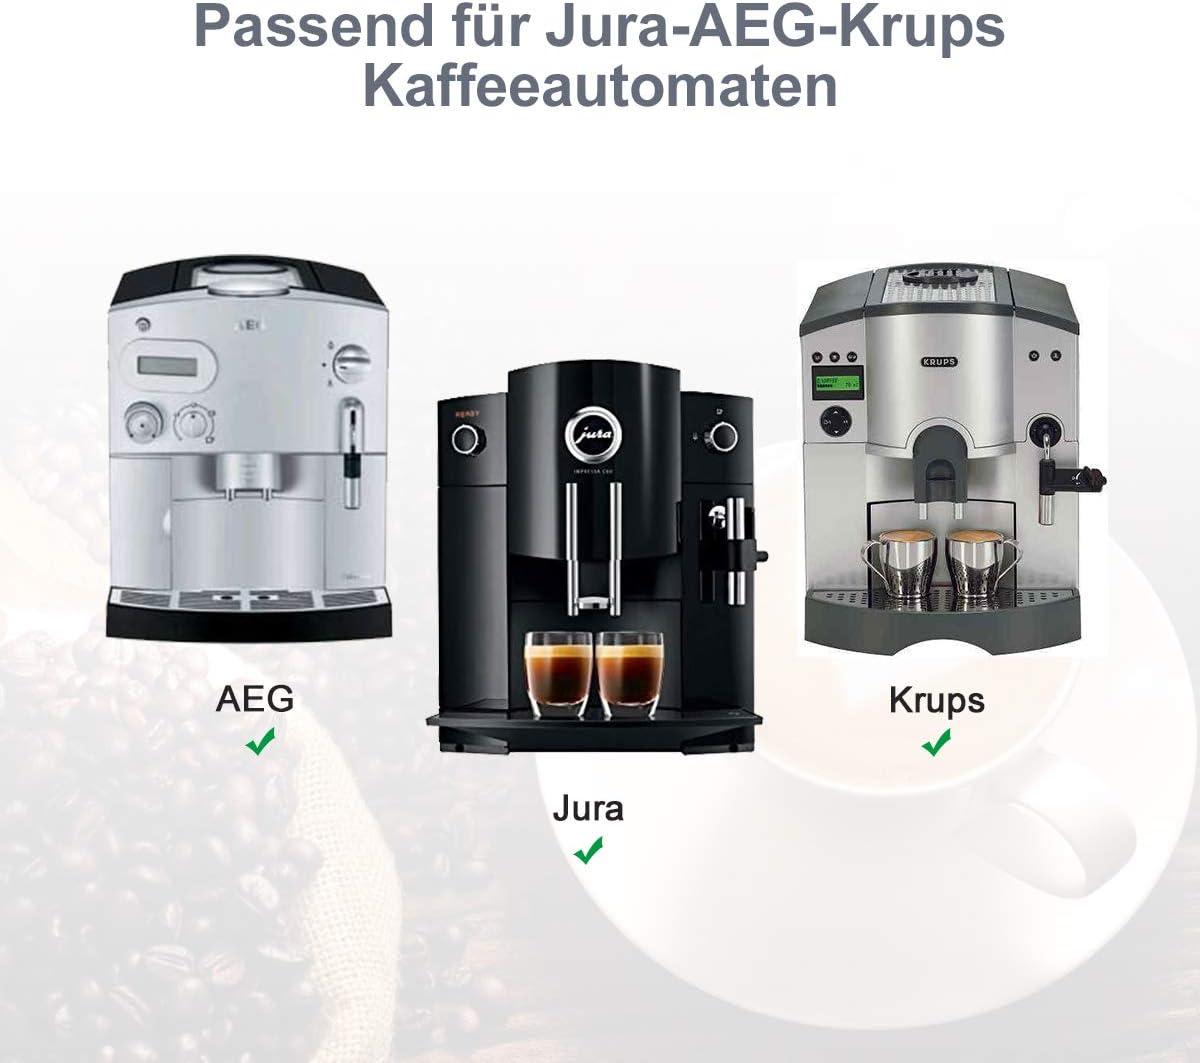 Aieve Llave de cabeza ovalada para reparar cafeteras automáticas Jura, Krups, AEG ohne Schlüsselring